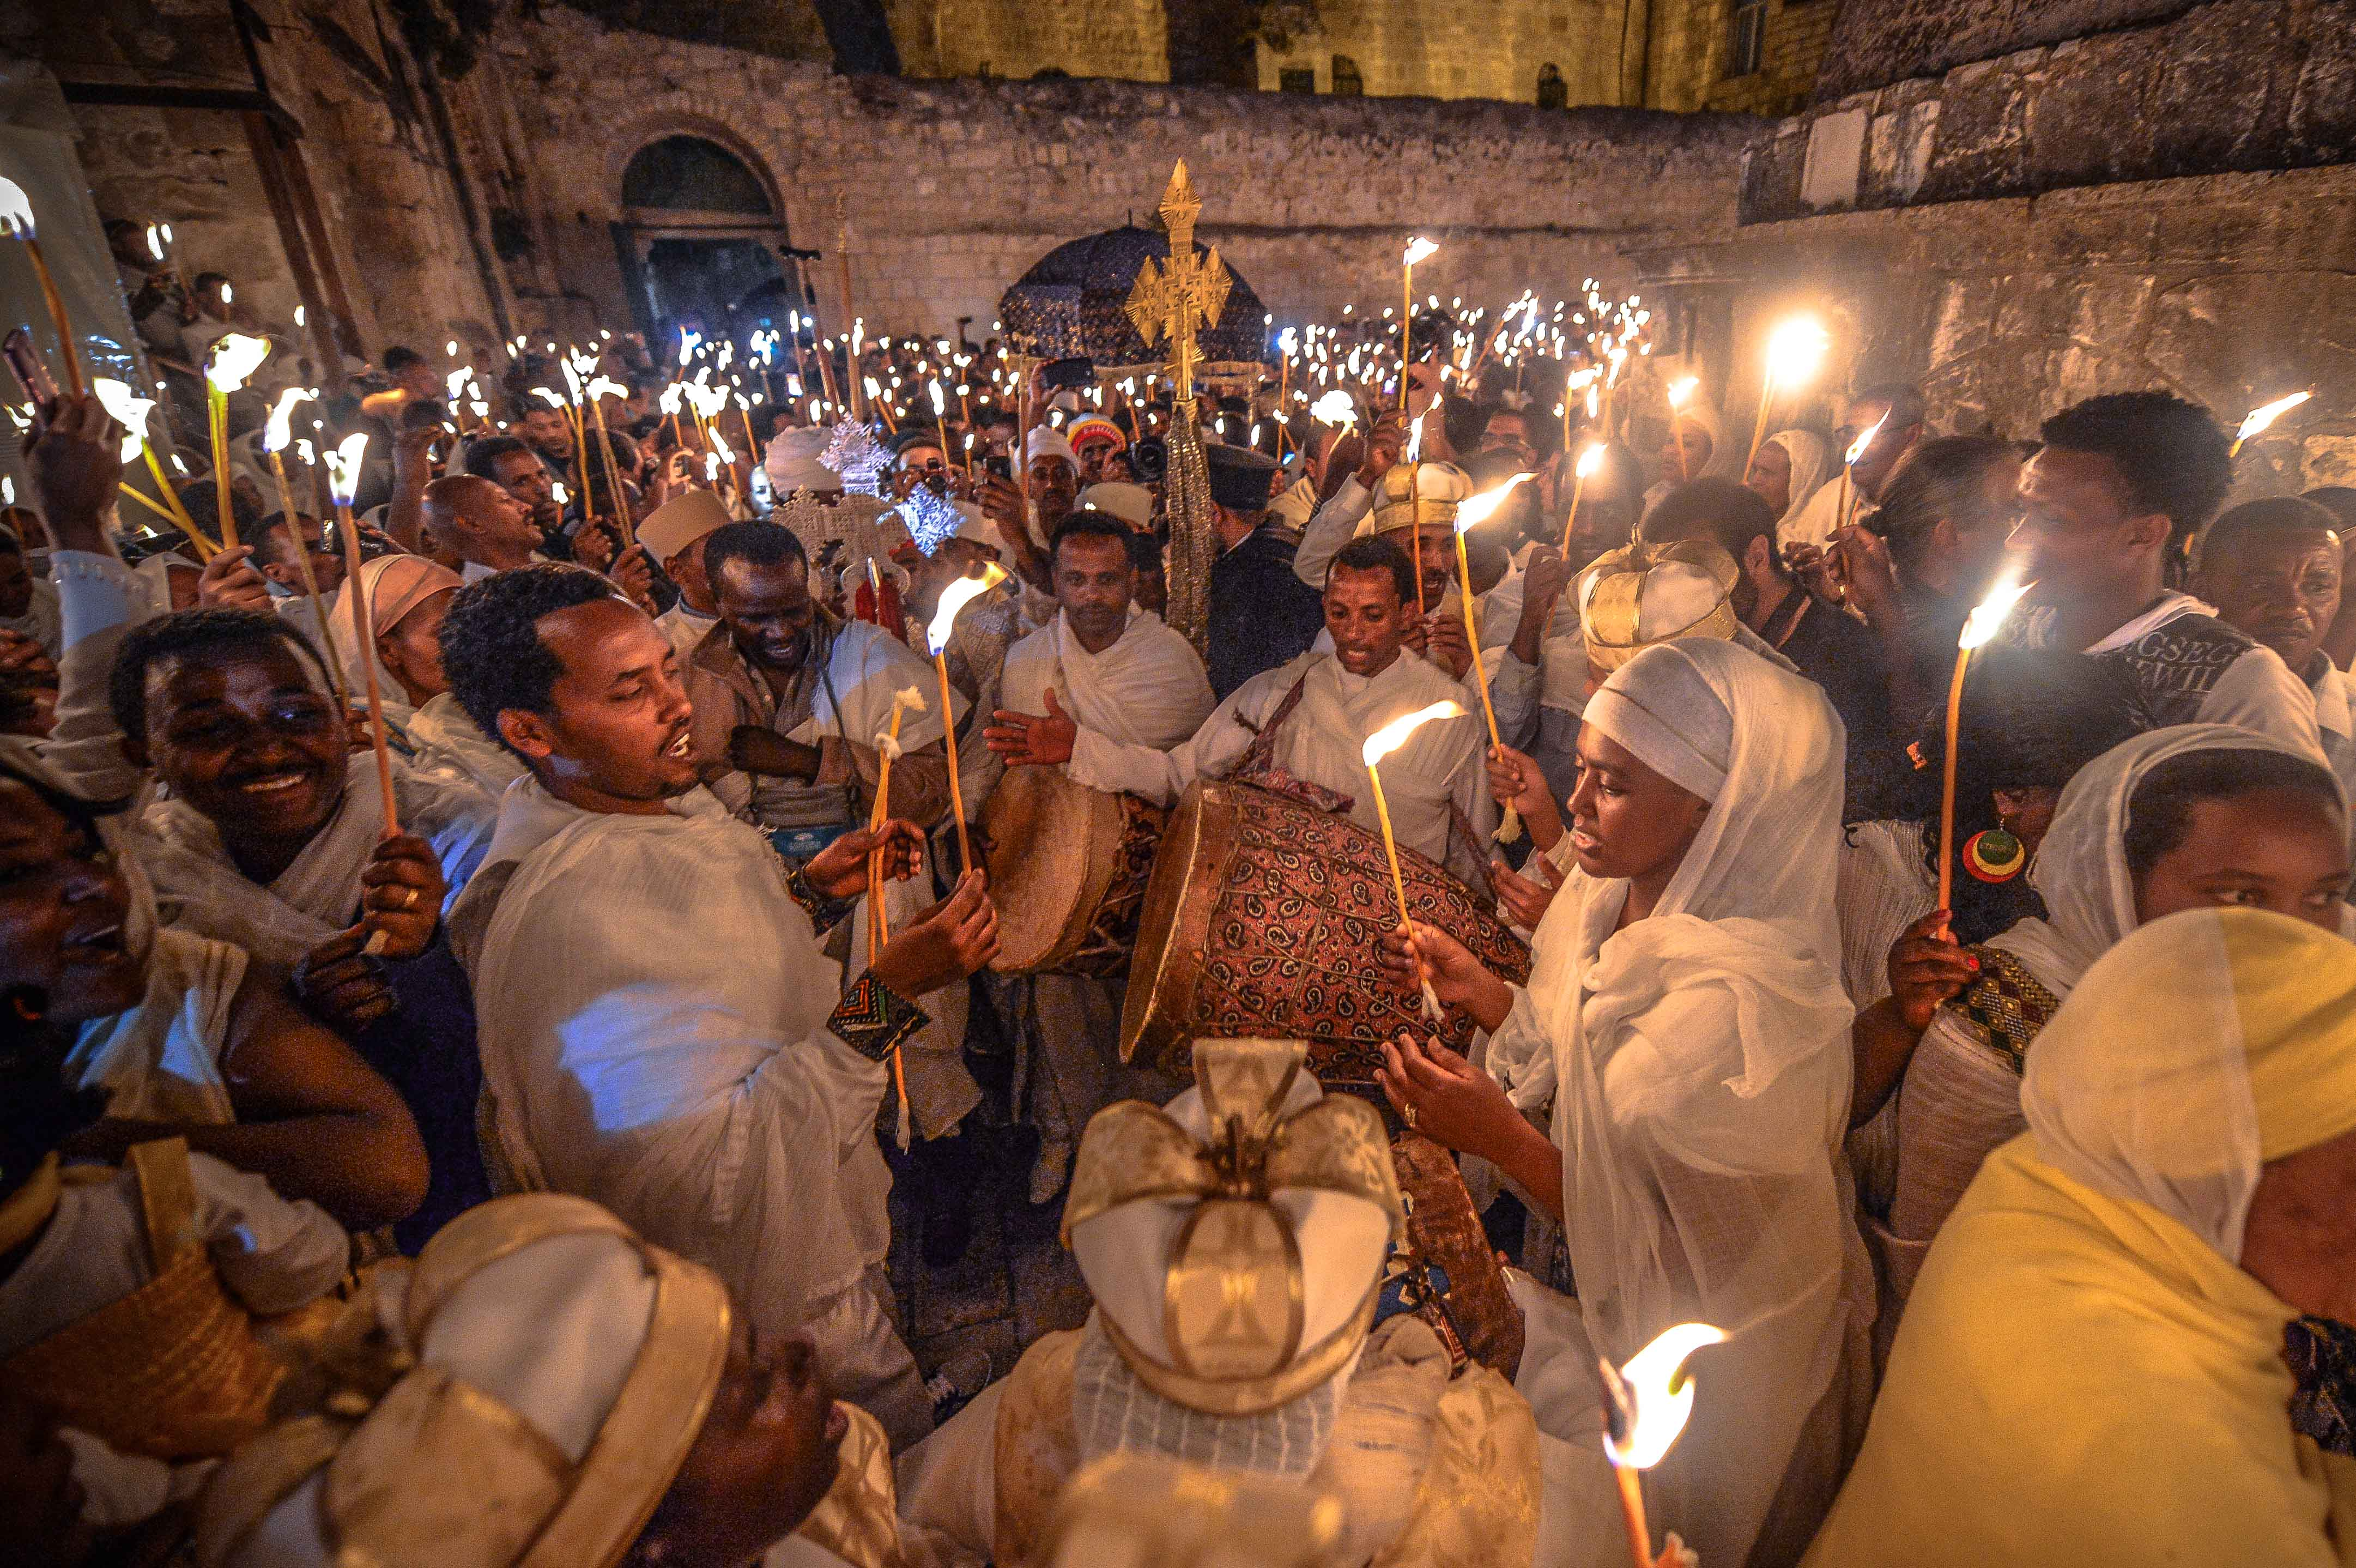 Prender Fuego Guitarra moreover Imagenes De Globos furthermore Children Background Images also Photos Ethiopian Easter Jerusalem moreover Grunge Backgrounds. on christmas is about jesus banner